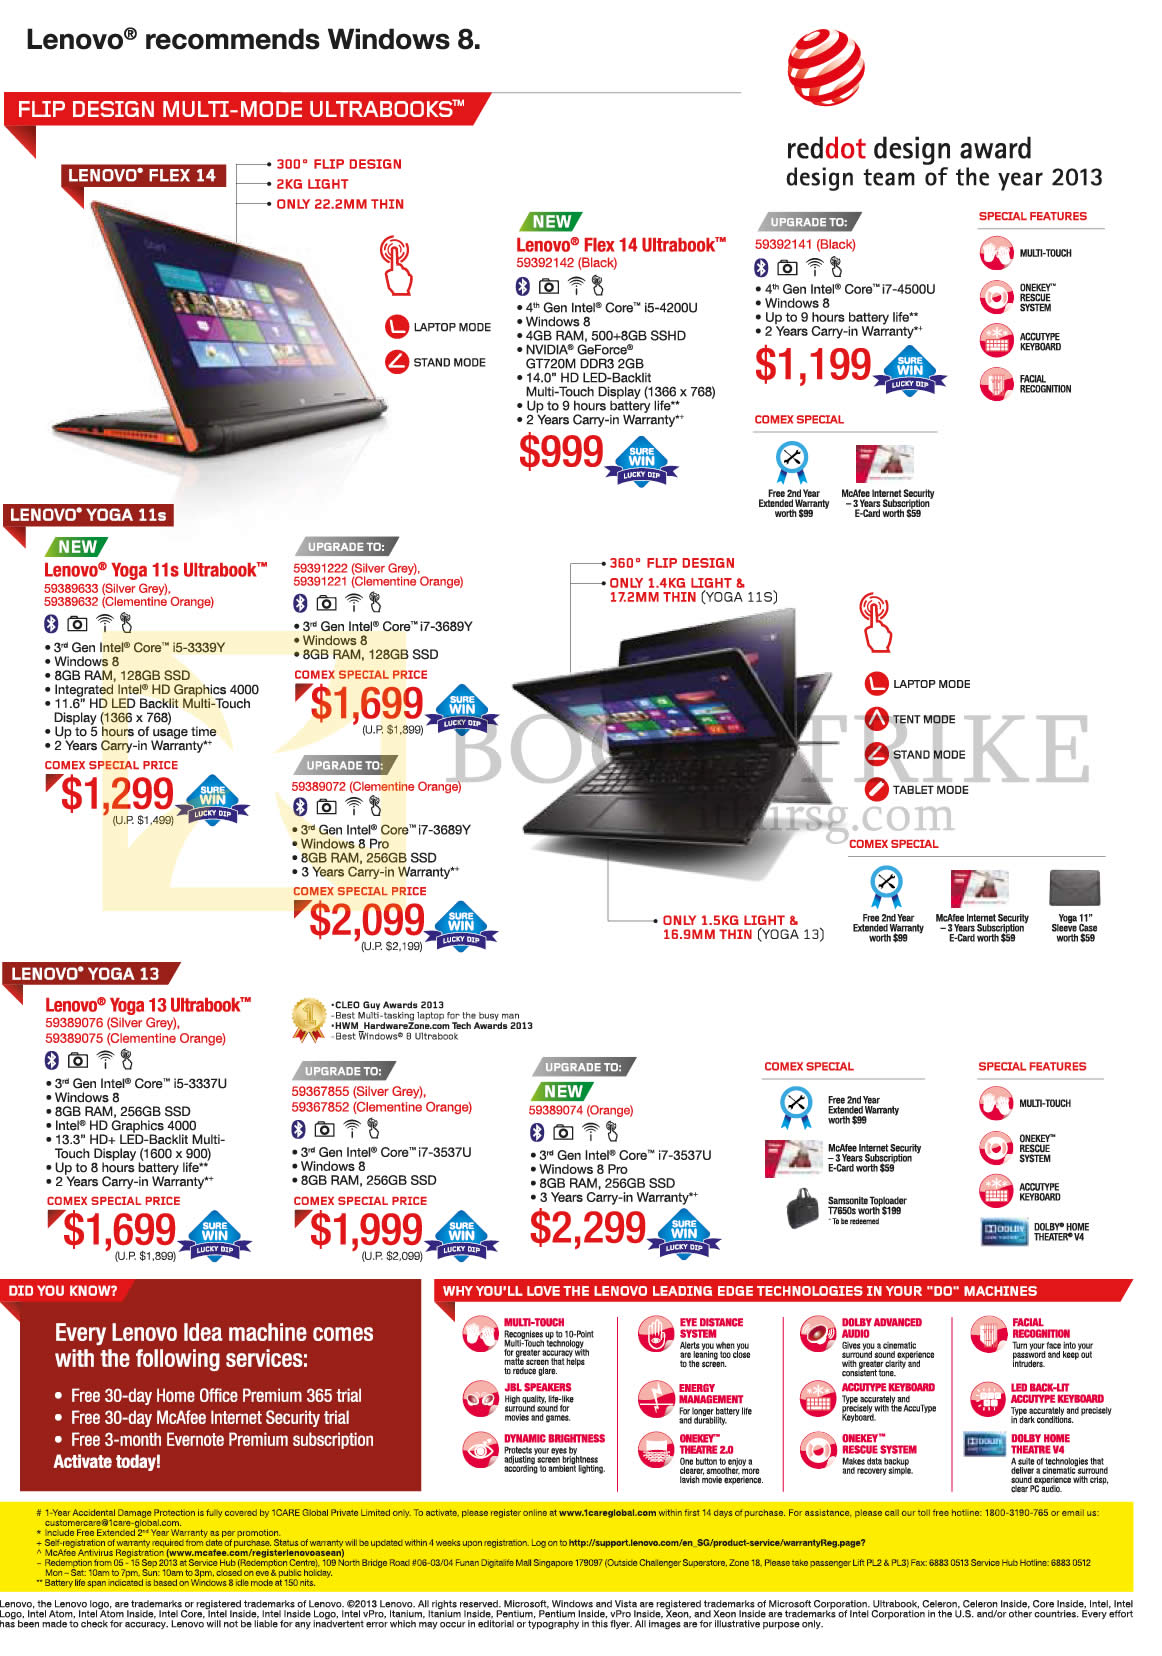 COMEX 2013 price list image brochure of Lenovo Notebooks Flex 14, Yoga 11s, Yoga 13